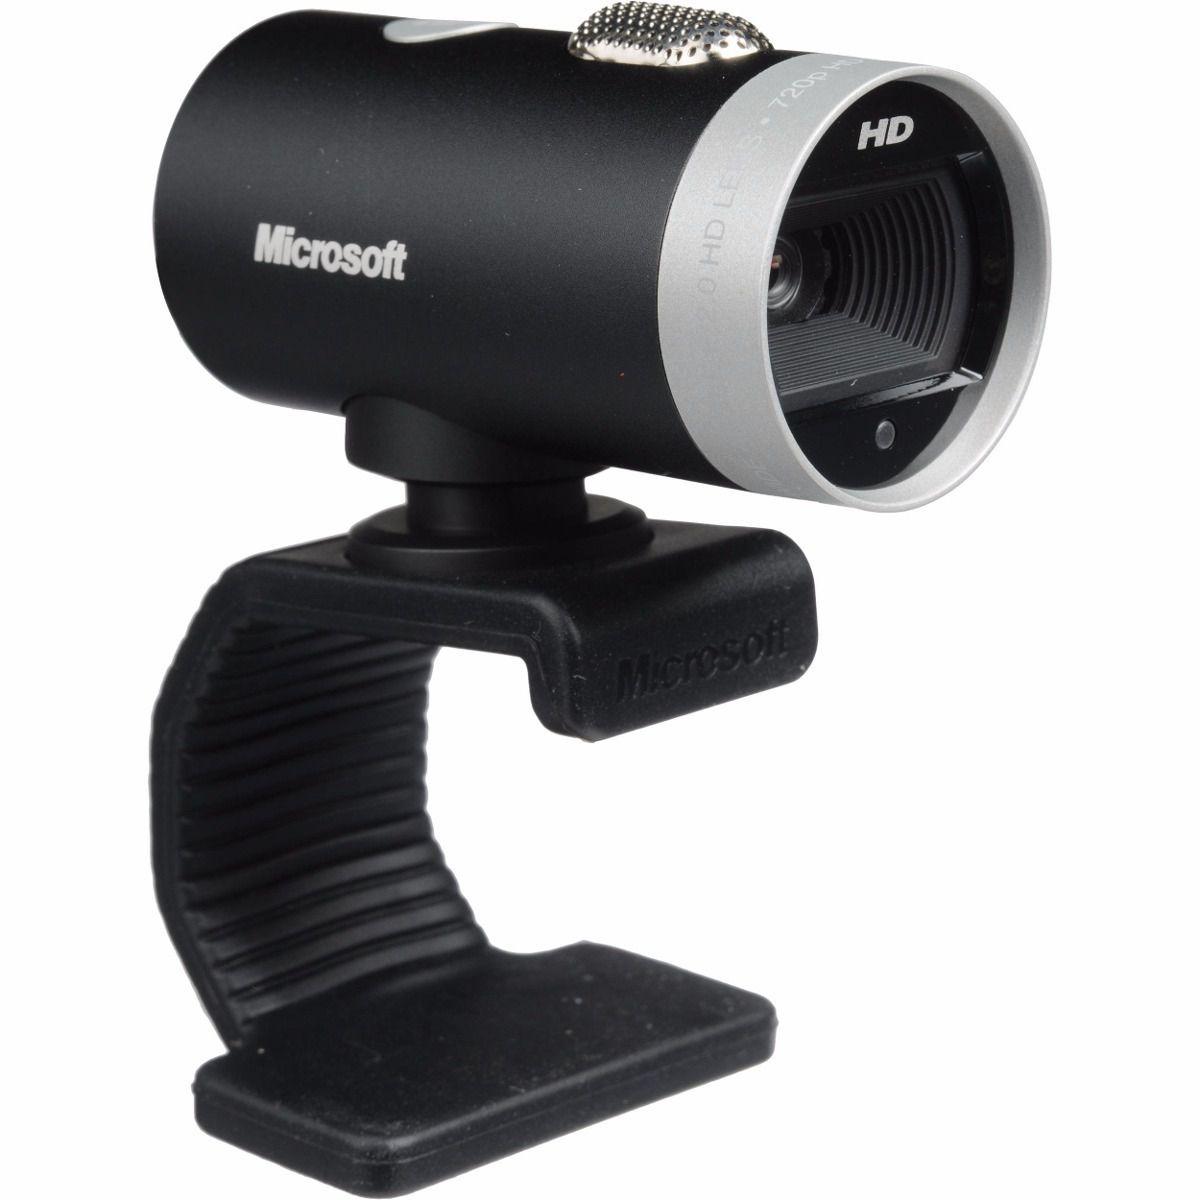 Web Cam Microsoft Cinema Hd 720p H5d-00013